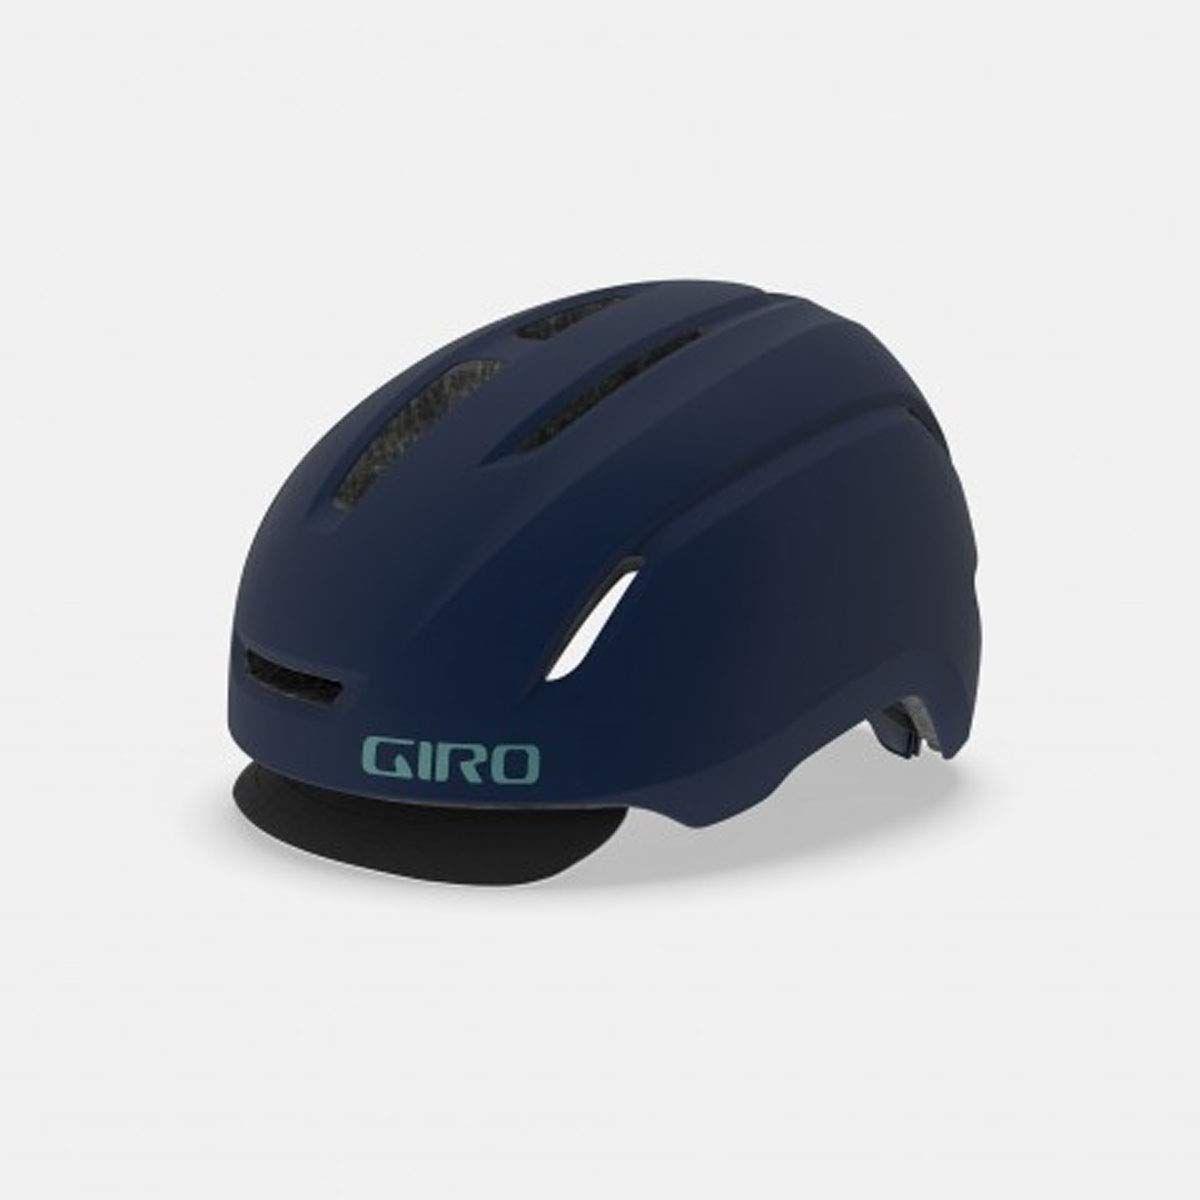 25 Best Bike Helmets For Commuters 2020 The Strategist New York Magazine